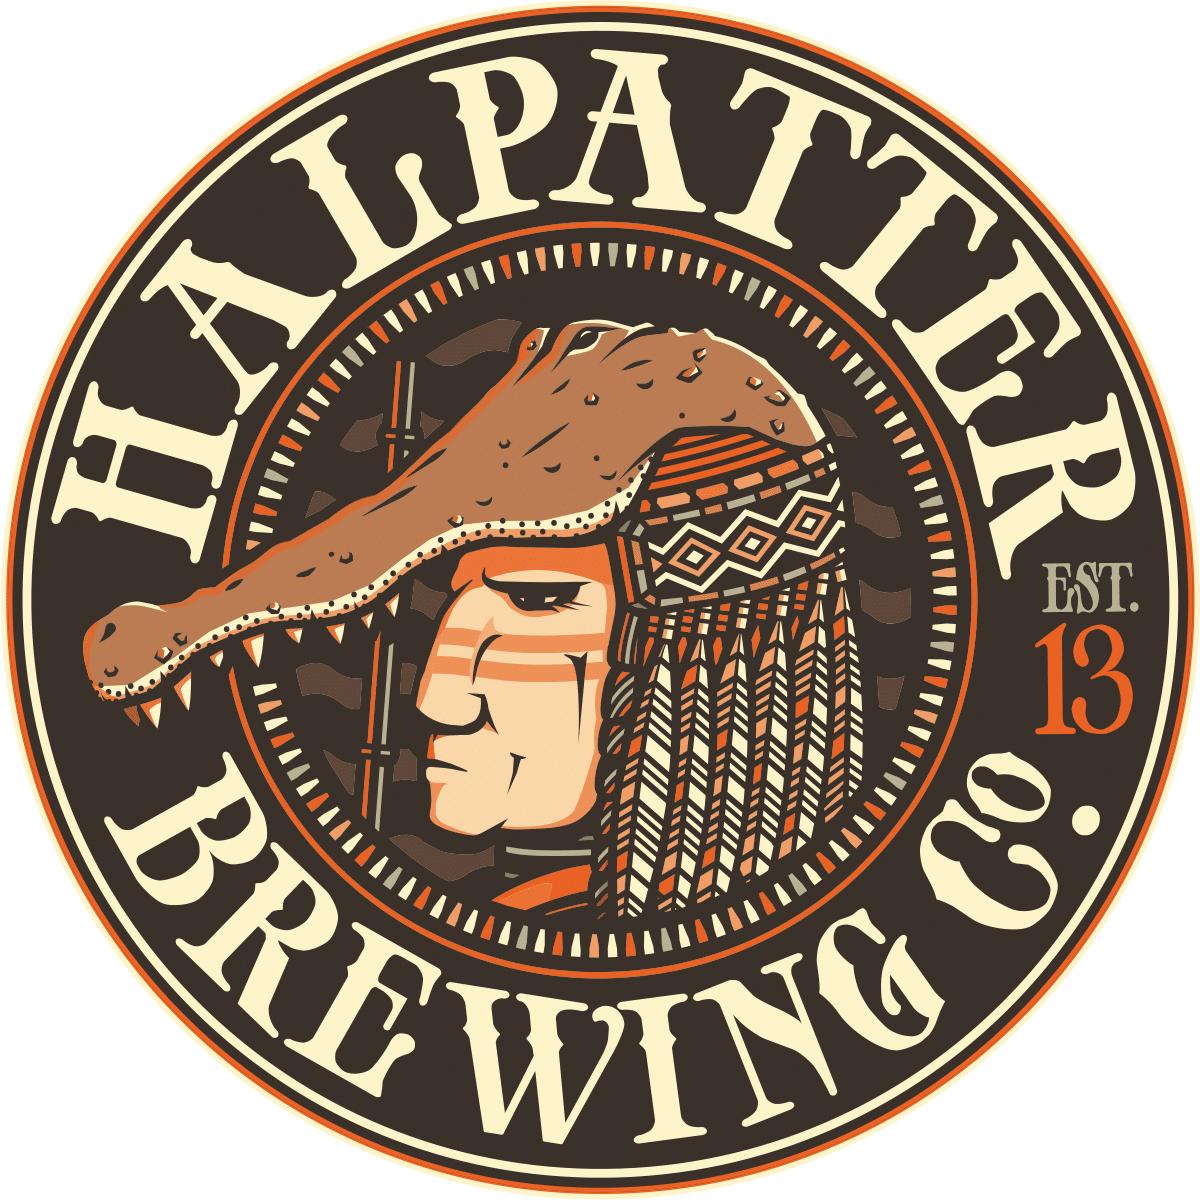 Halpatter Brewing